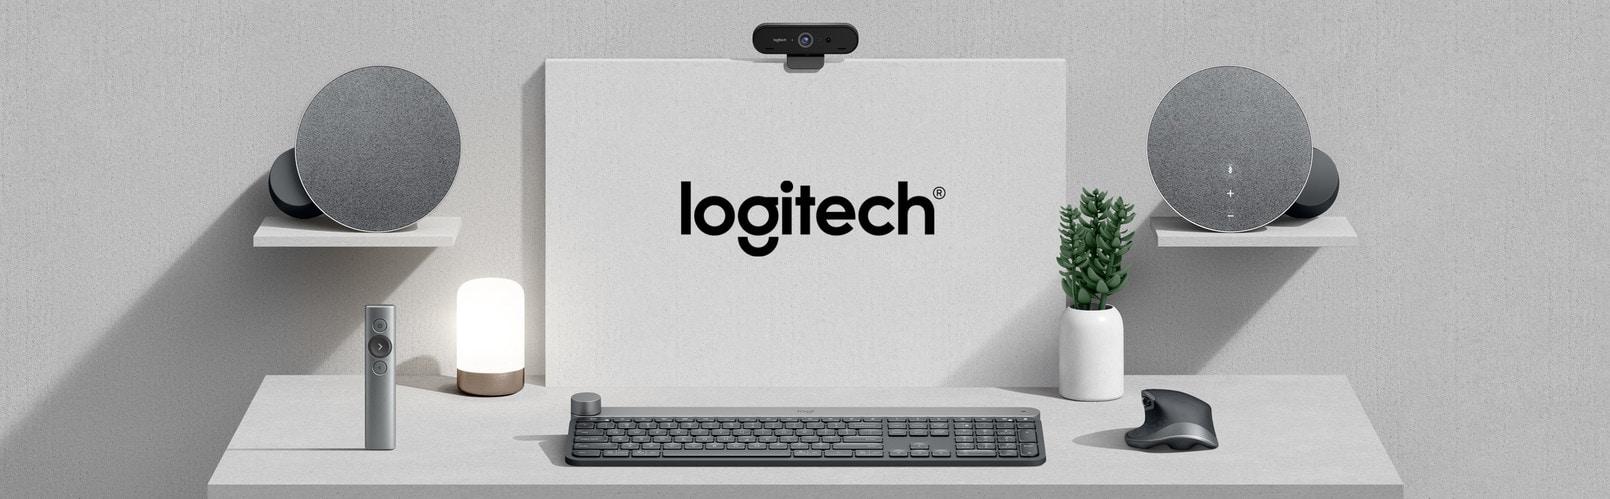 Logitech Adobe